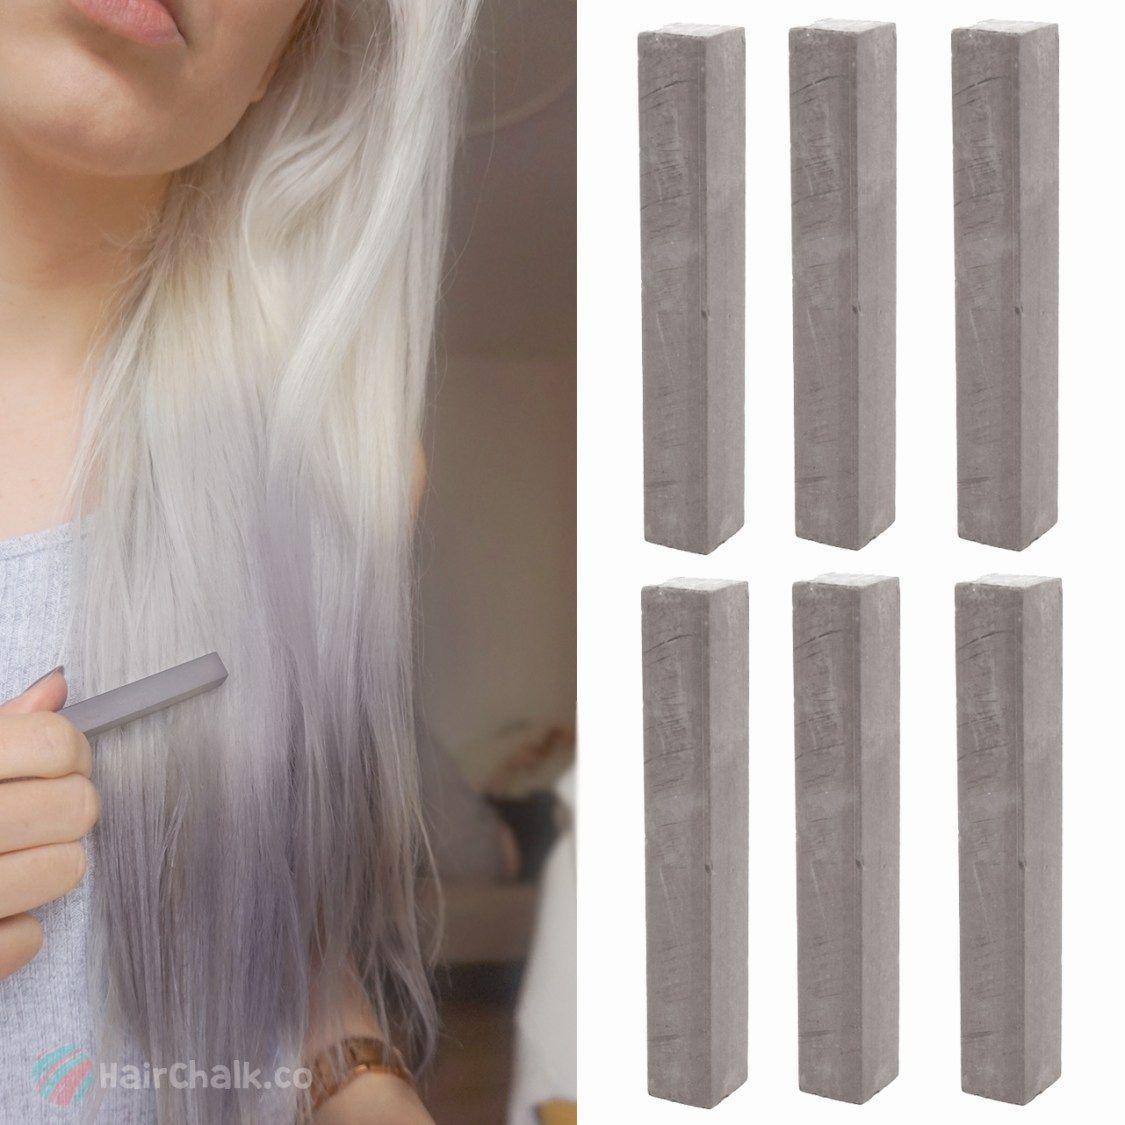 Best Ash Gray Hair Dye Set Cloudy 6 Dark Grey Hair Chalks Diy Dim Grey Hairchalk Kit Grey Hair Dye Grey Hair Color Dark Blonde Hair Color